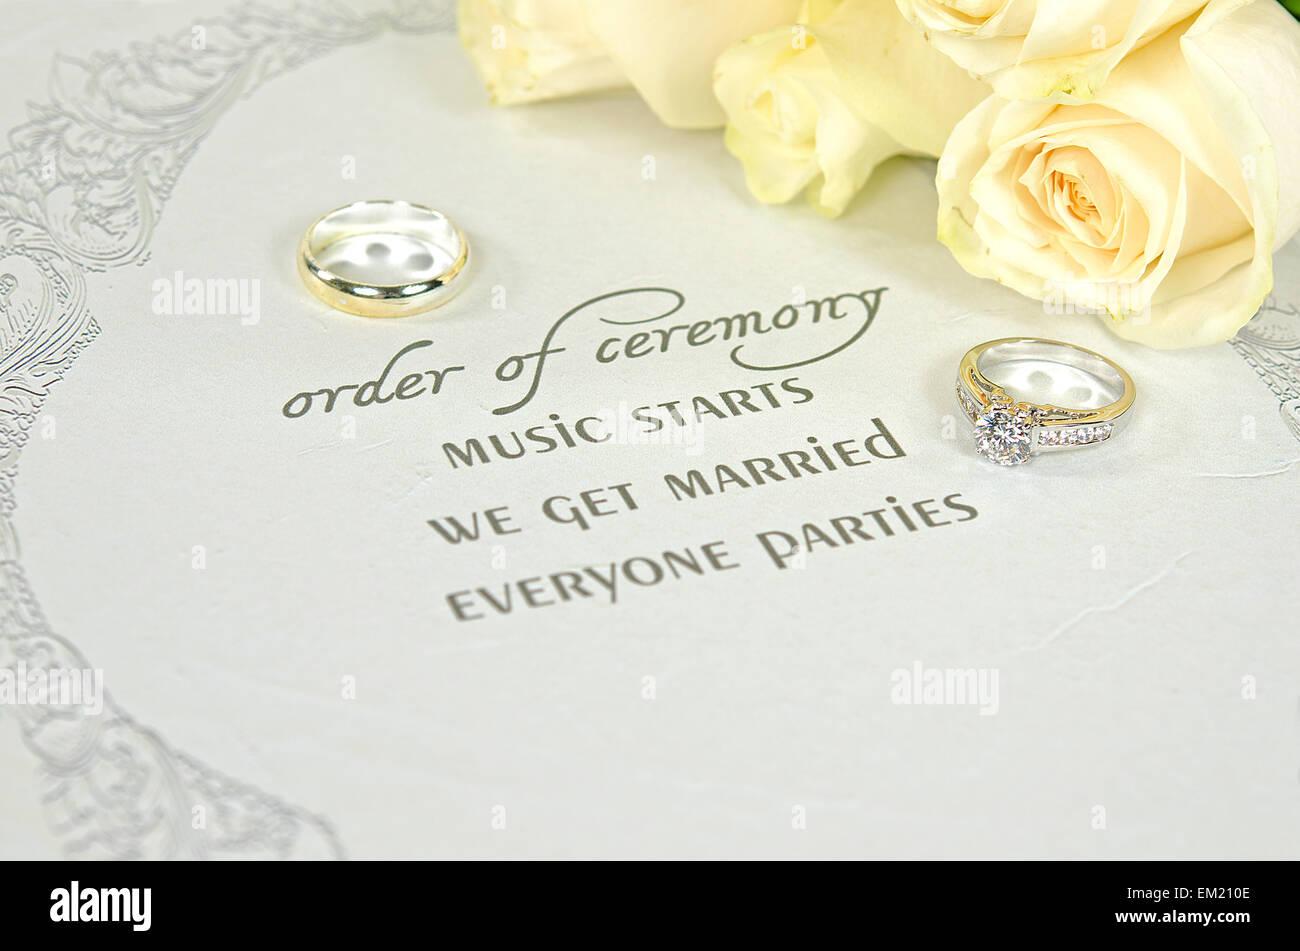 Wedding Invitation Invite Stock Photos & Wedding Invitation Invite ...